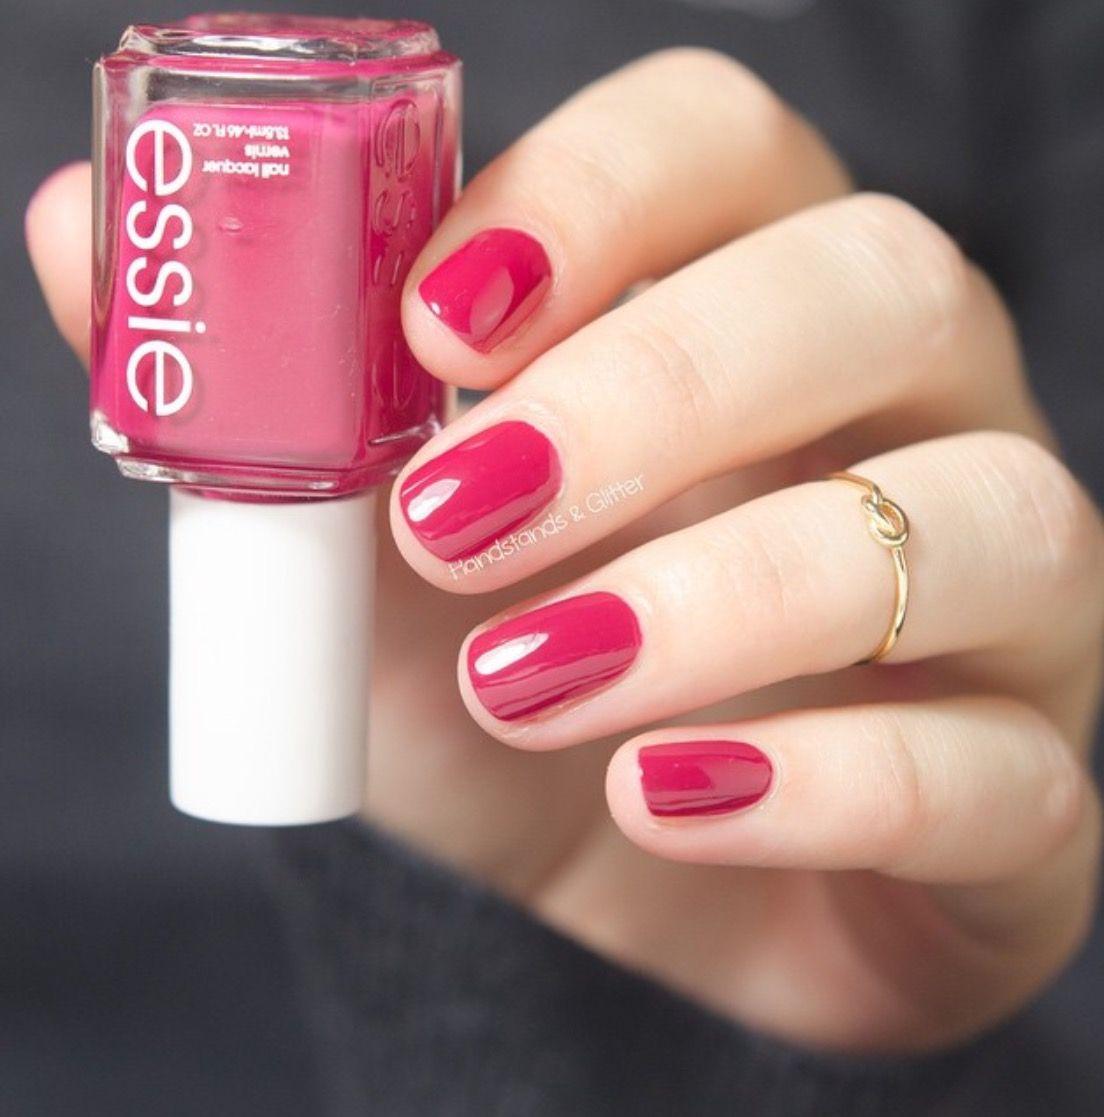 Essie :: plumberry | A good manicure | Pinterest | Hair makeup ...